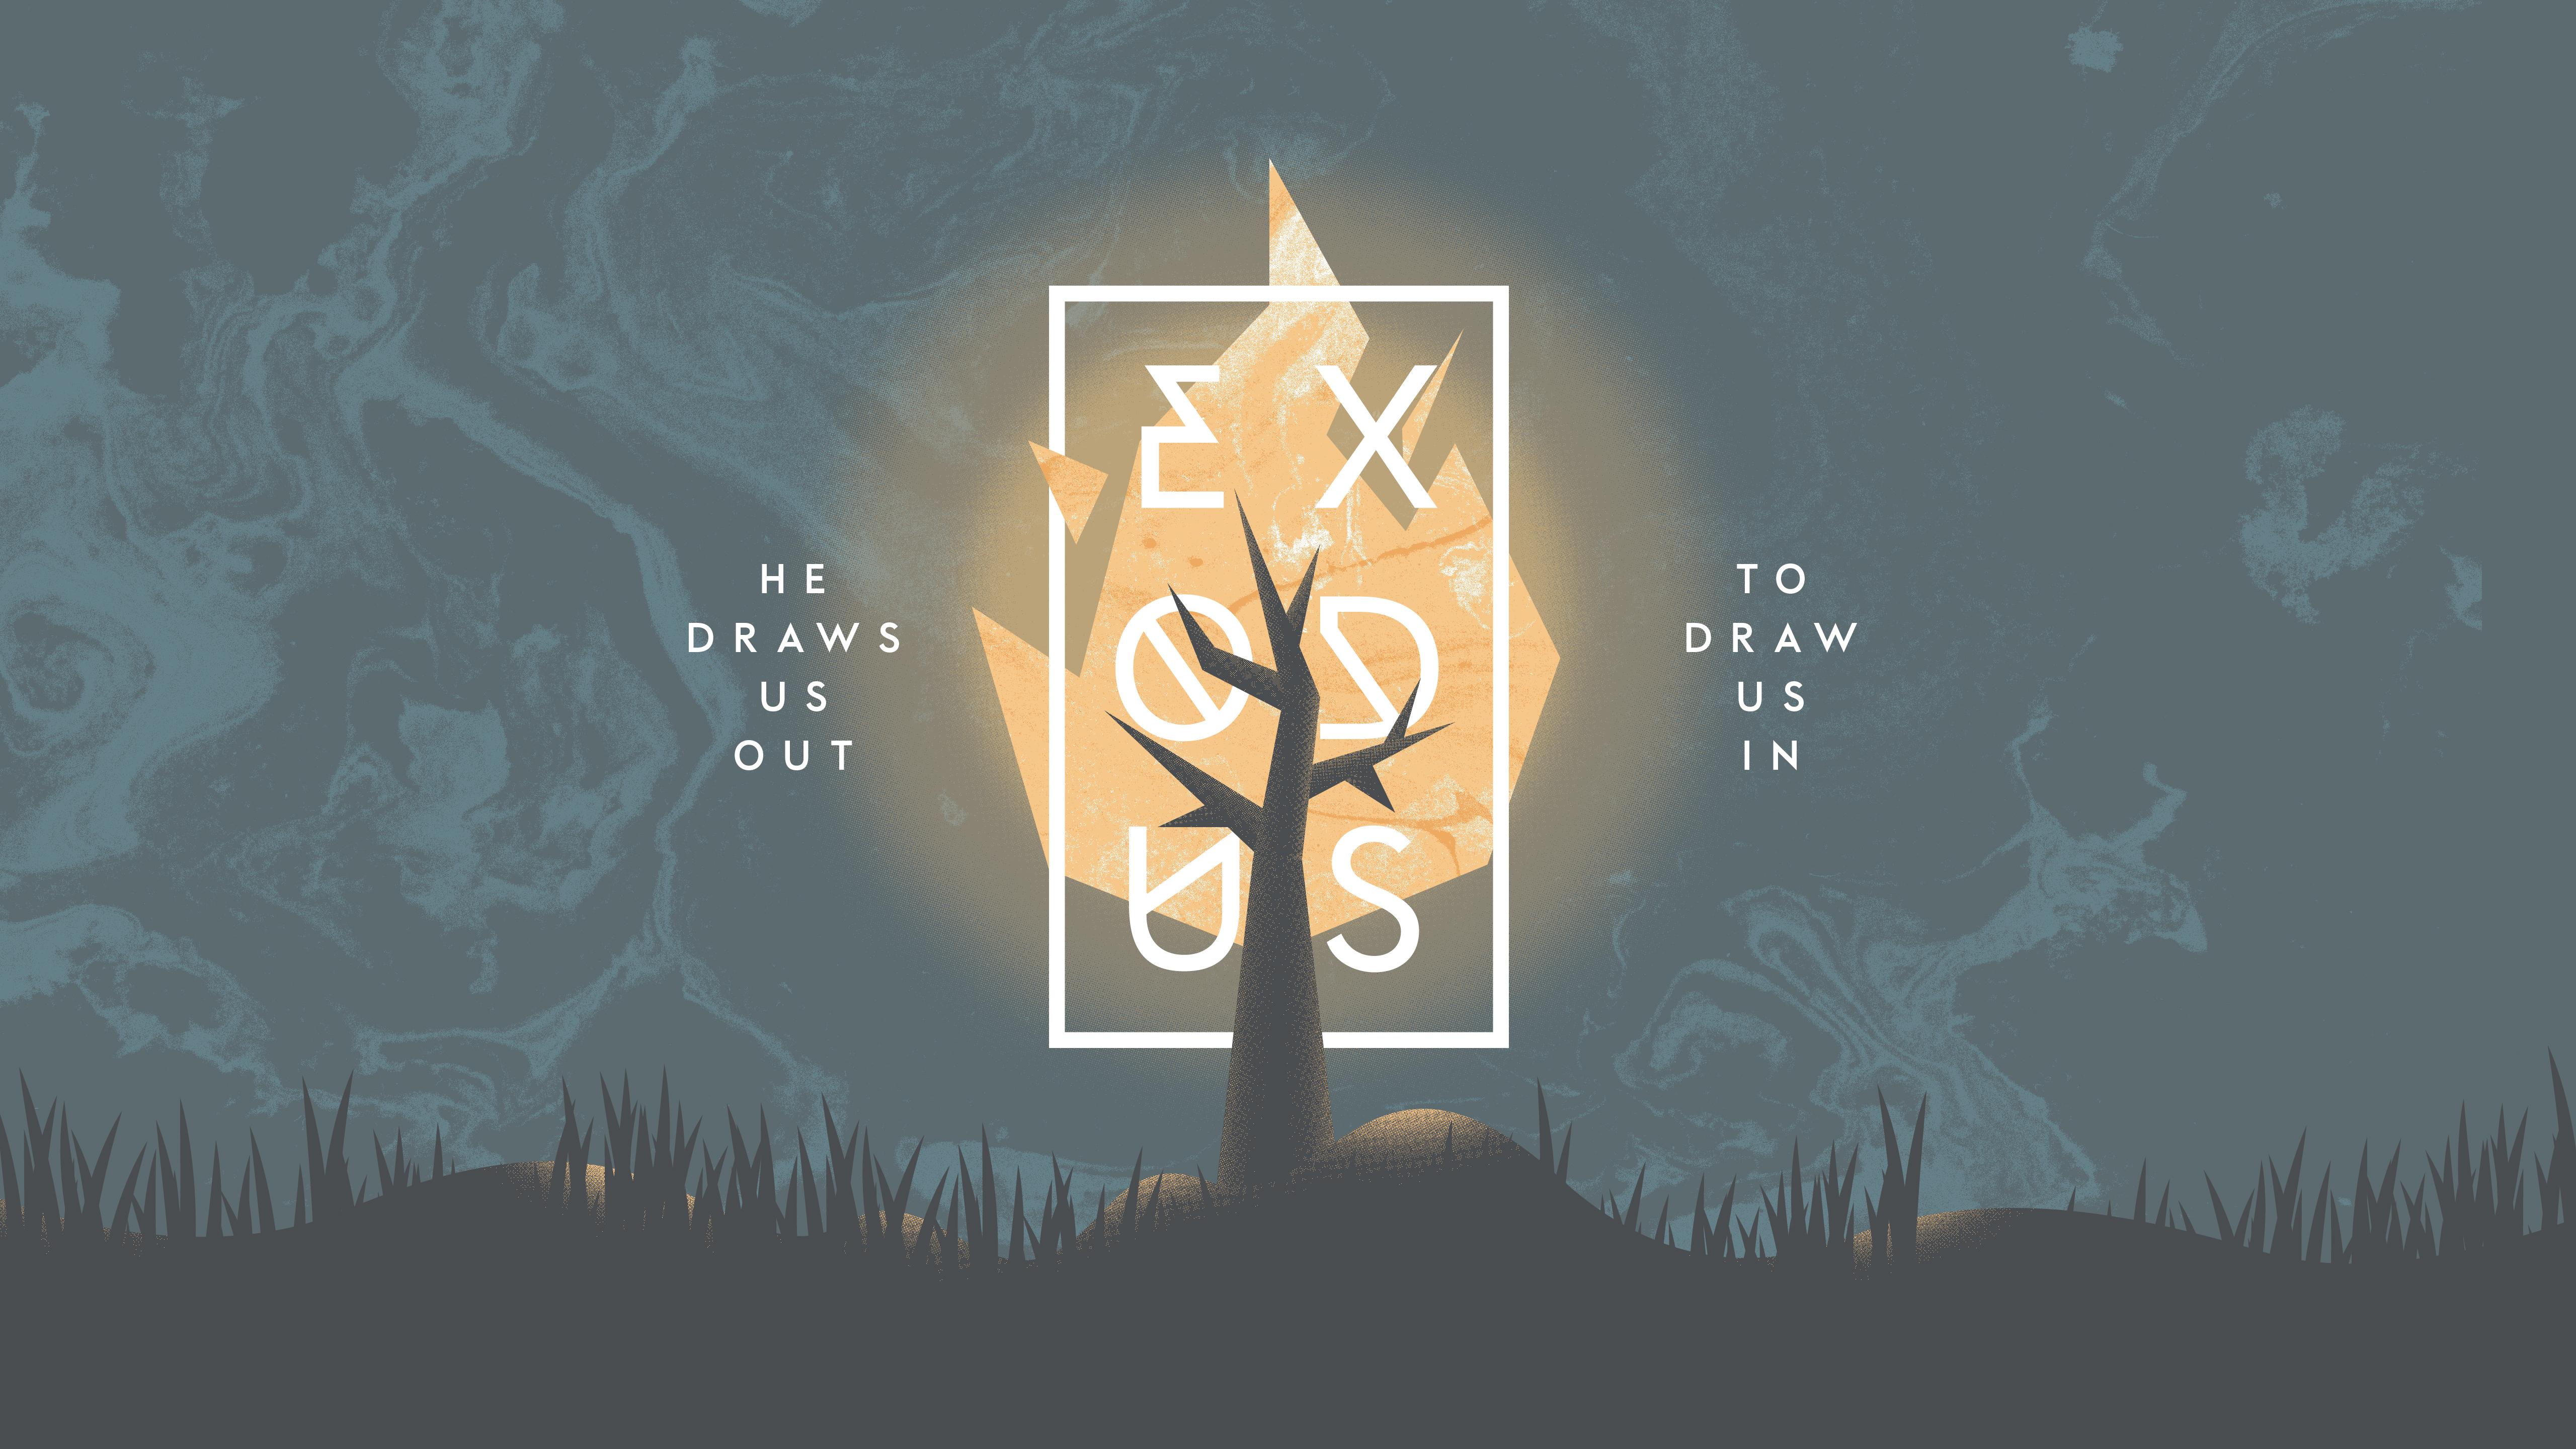 Lead pastors   2016   exodus desktop background   burning bush